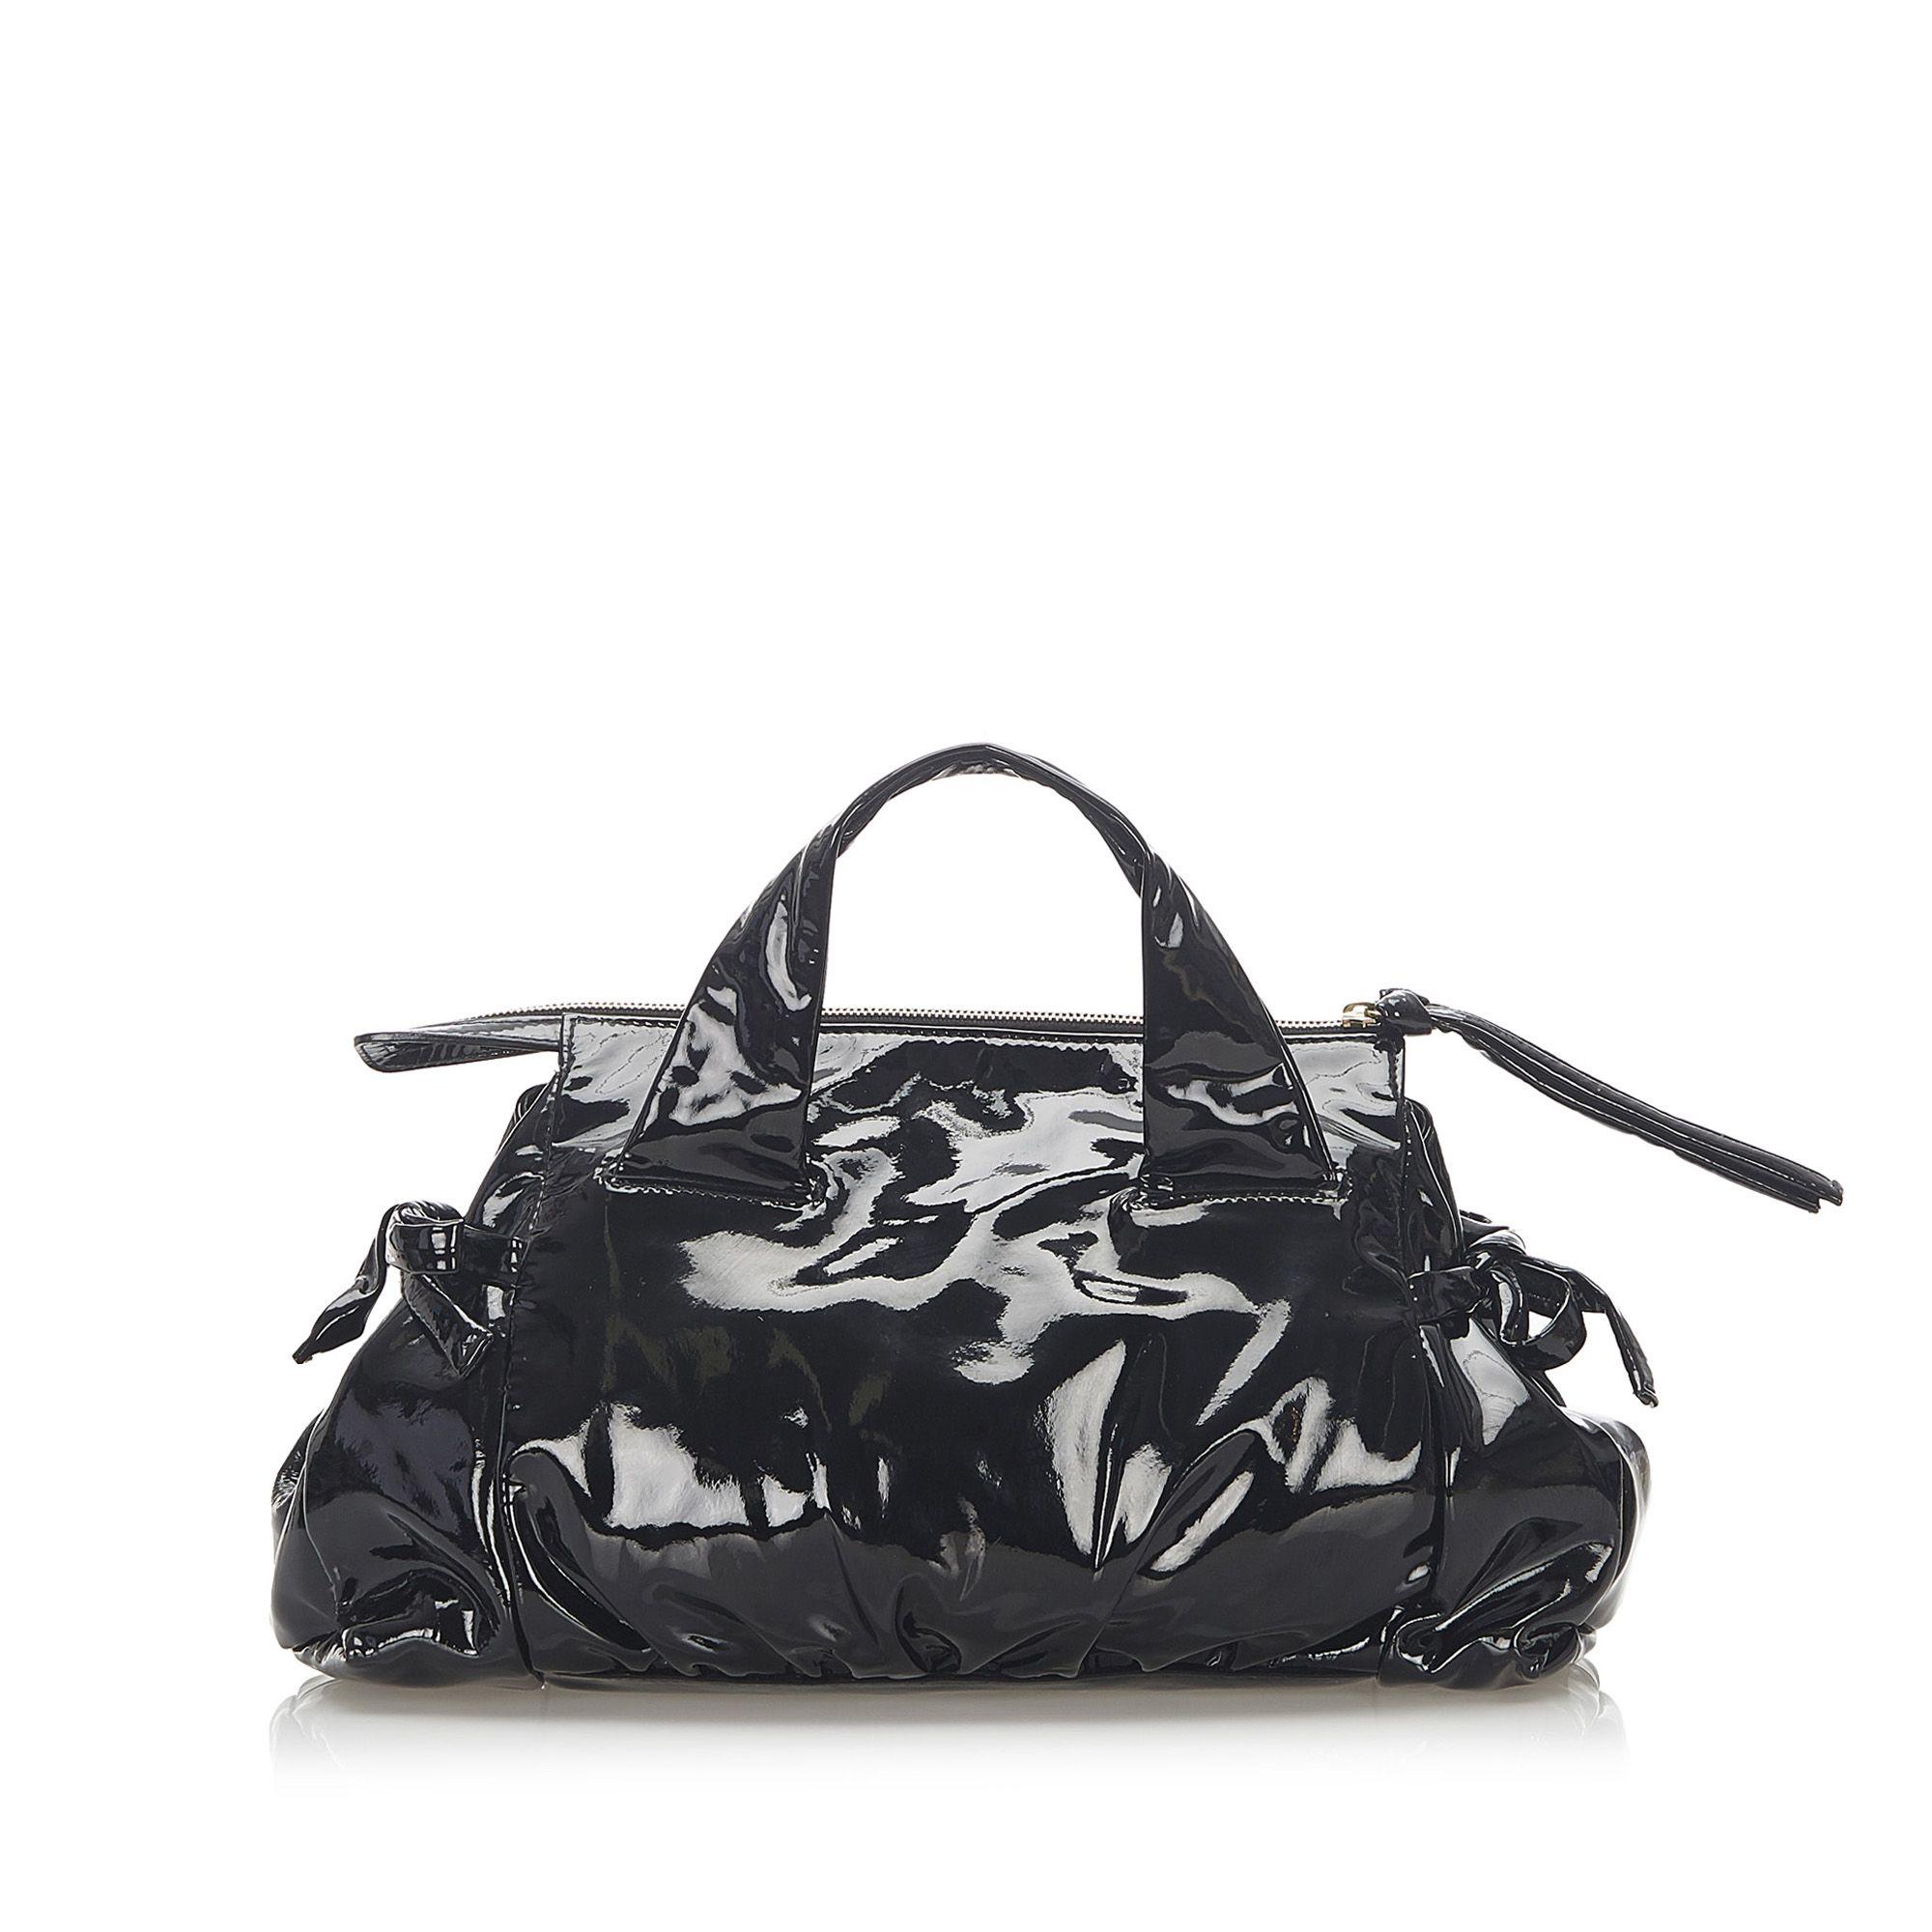 Vintage Gucci Hysteria Patent Leather Handbag Black